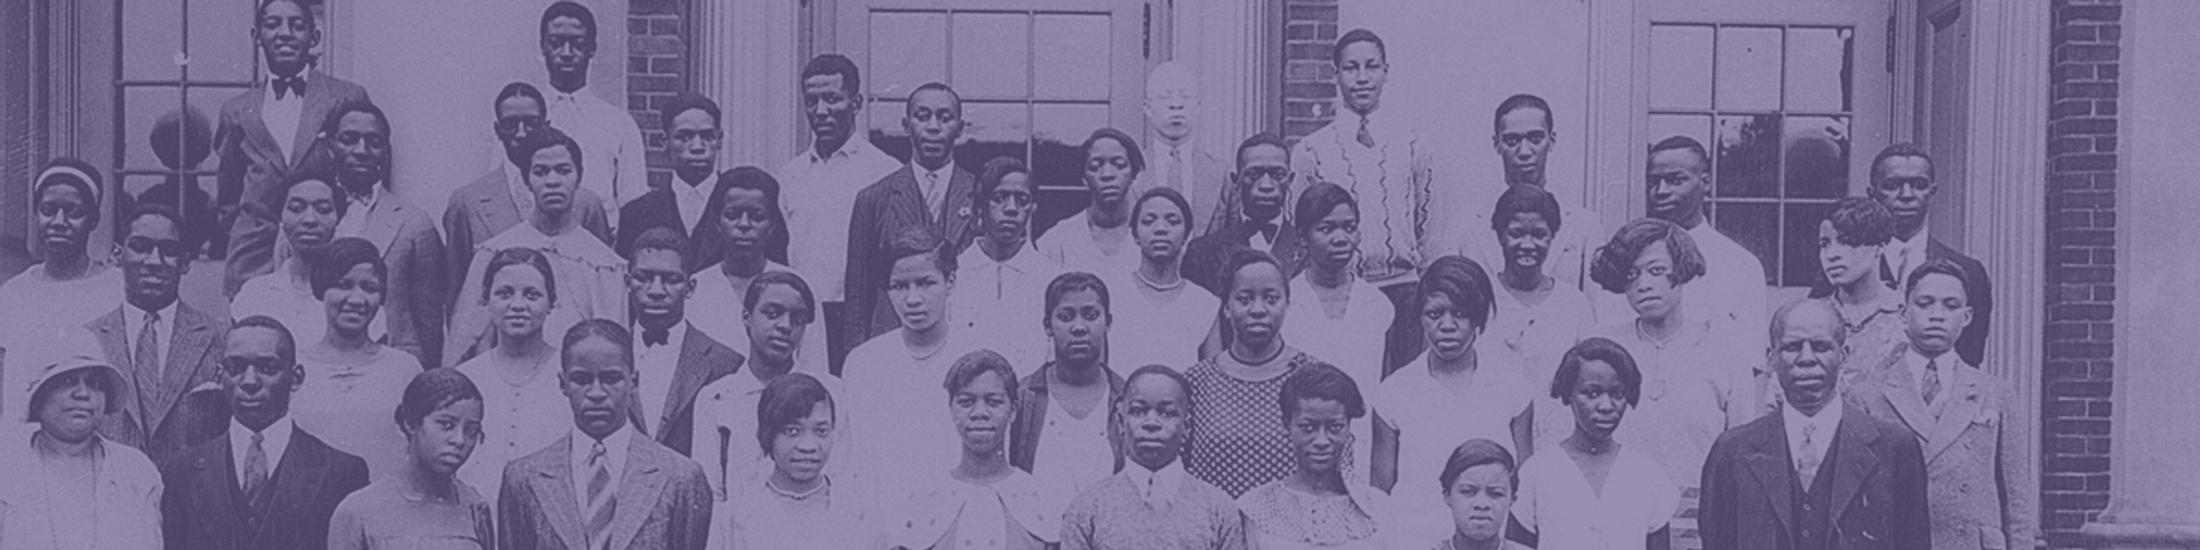 Howard High School school portrait, 1929